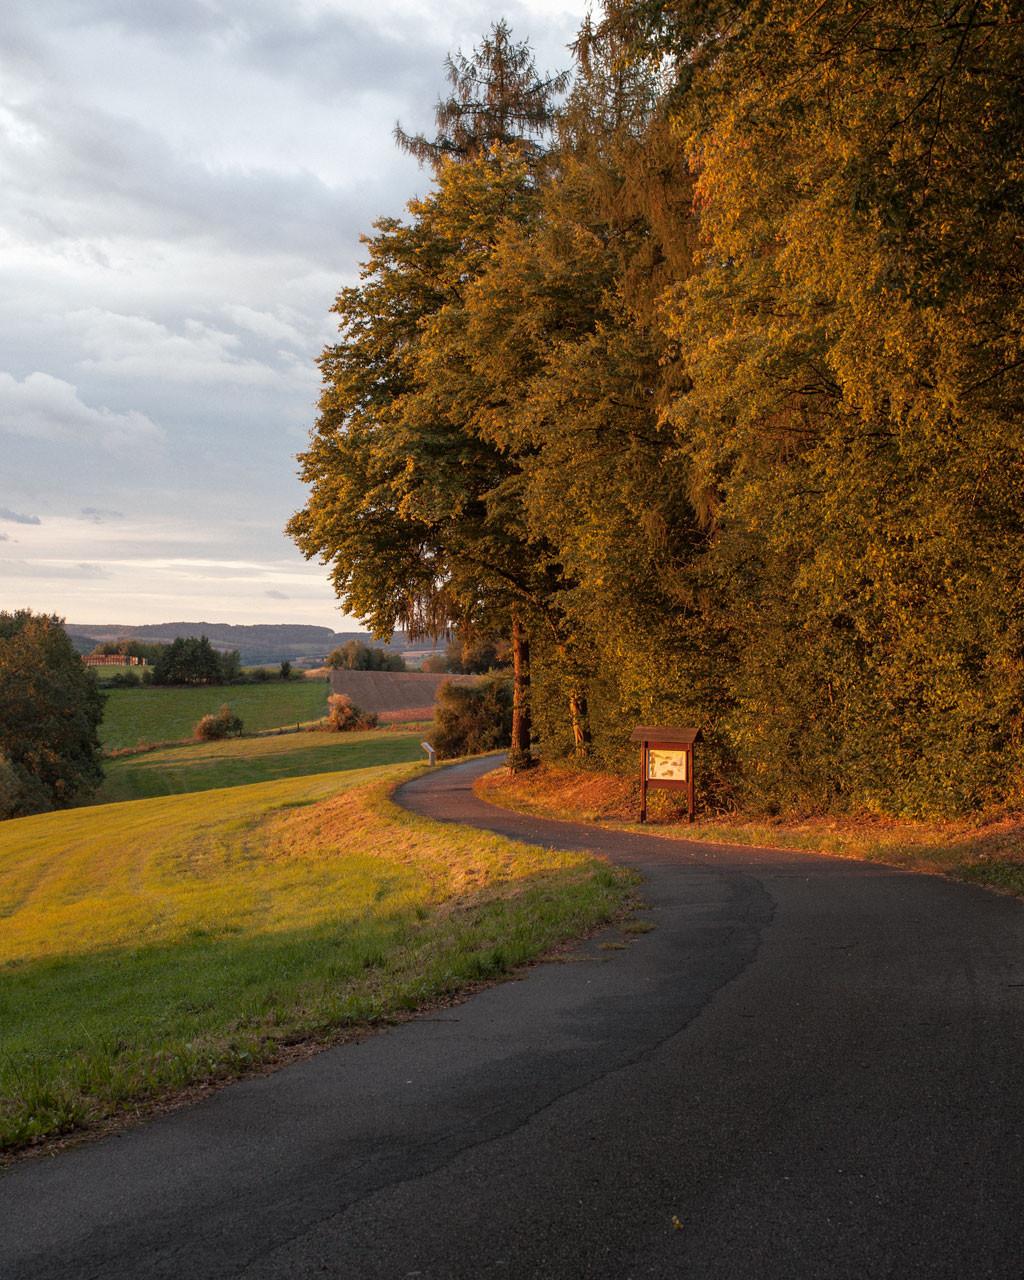 Timo_Stammberger_Duderstadt_Landscape_Forerest_Wald_Herbst_Fall_02